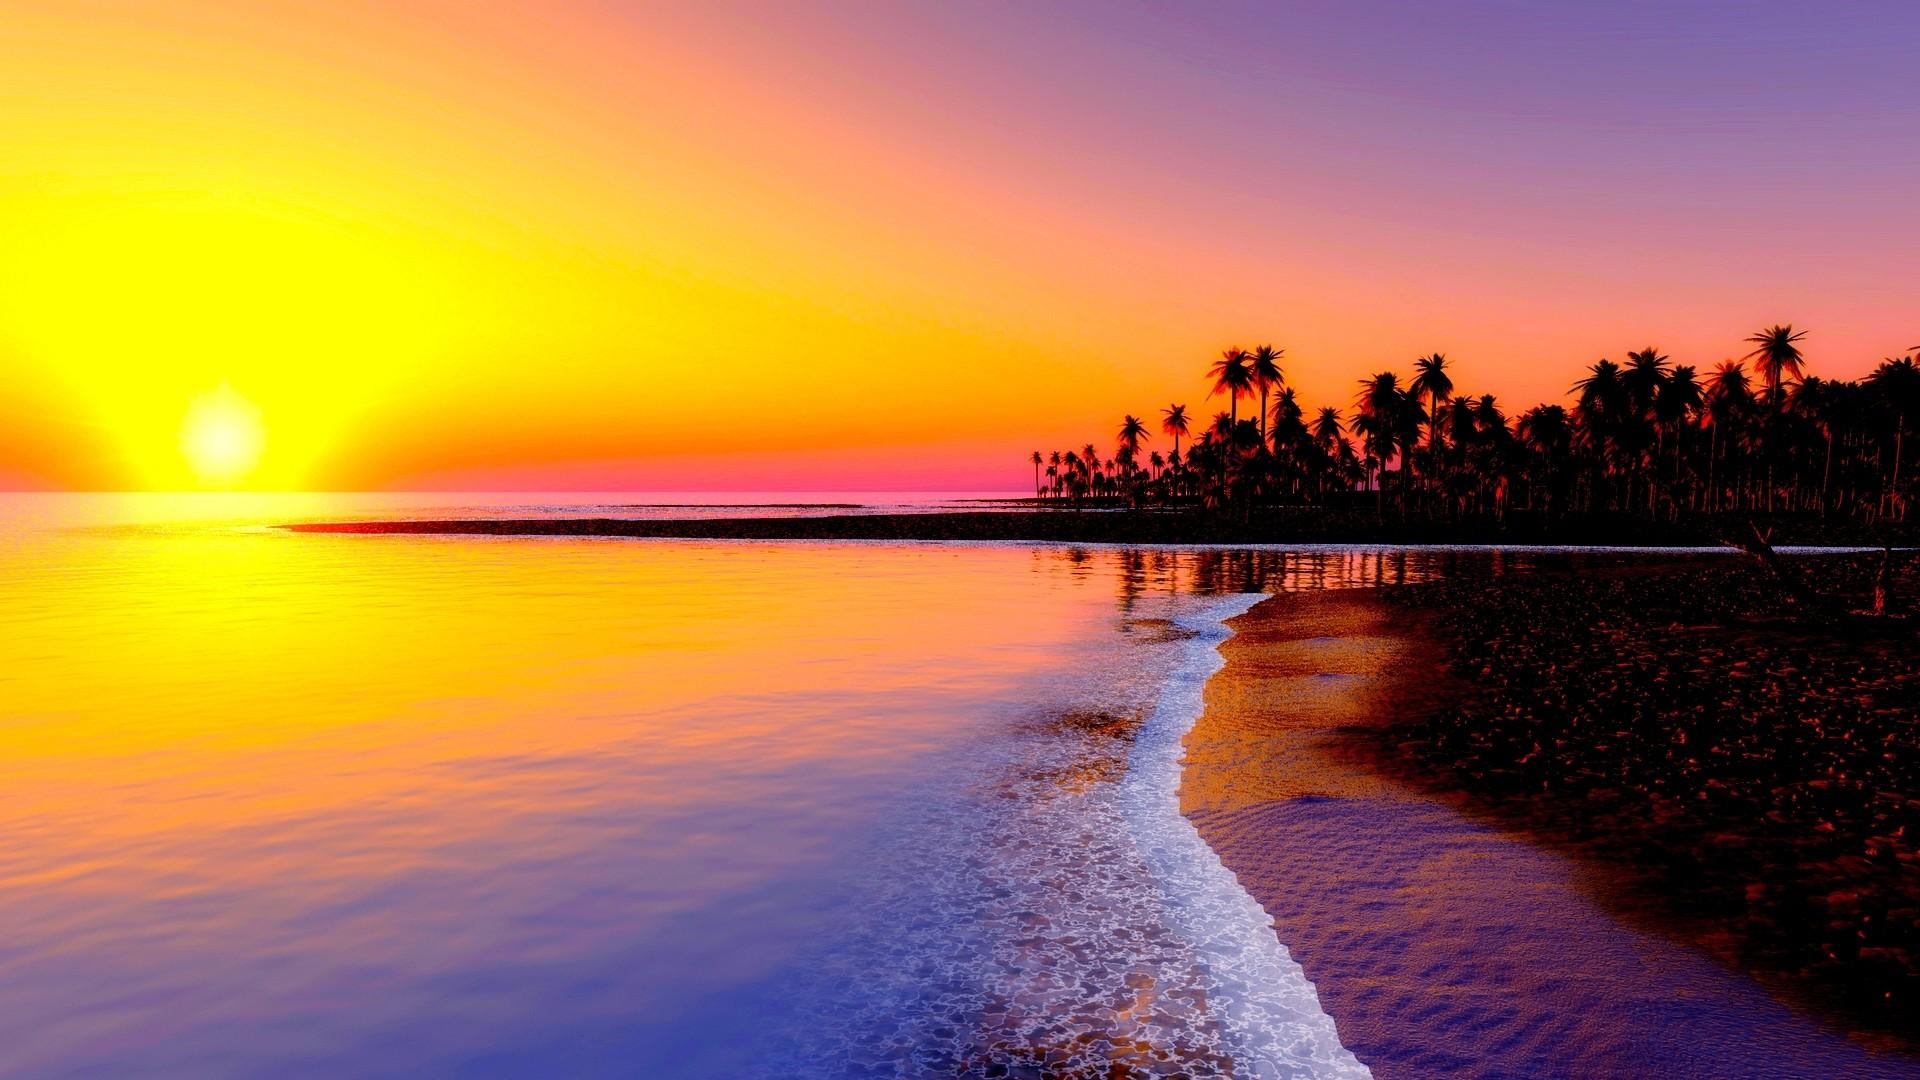 Preview wallpaper beach, tropics, sea, sand, palm trees, sunset 1920×1080